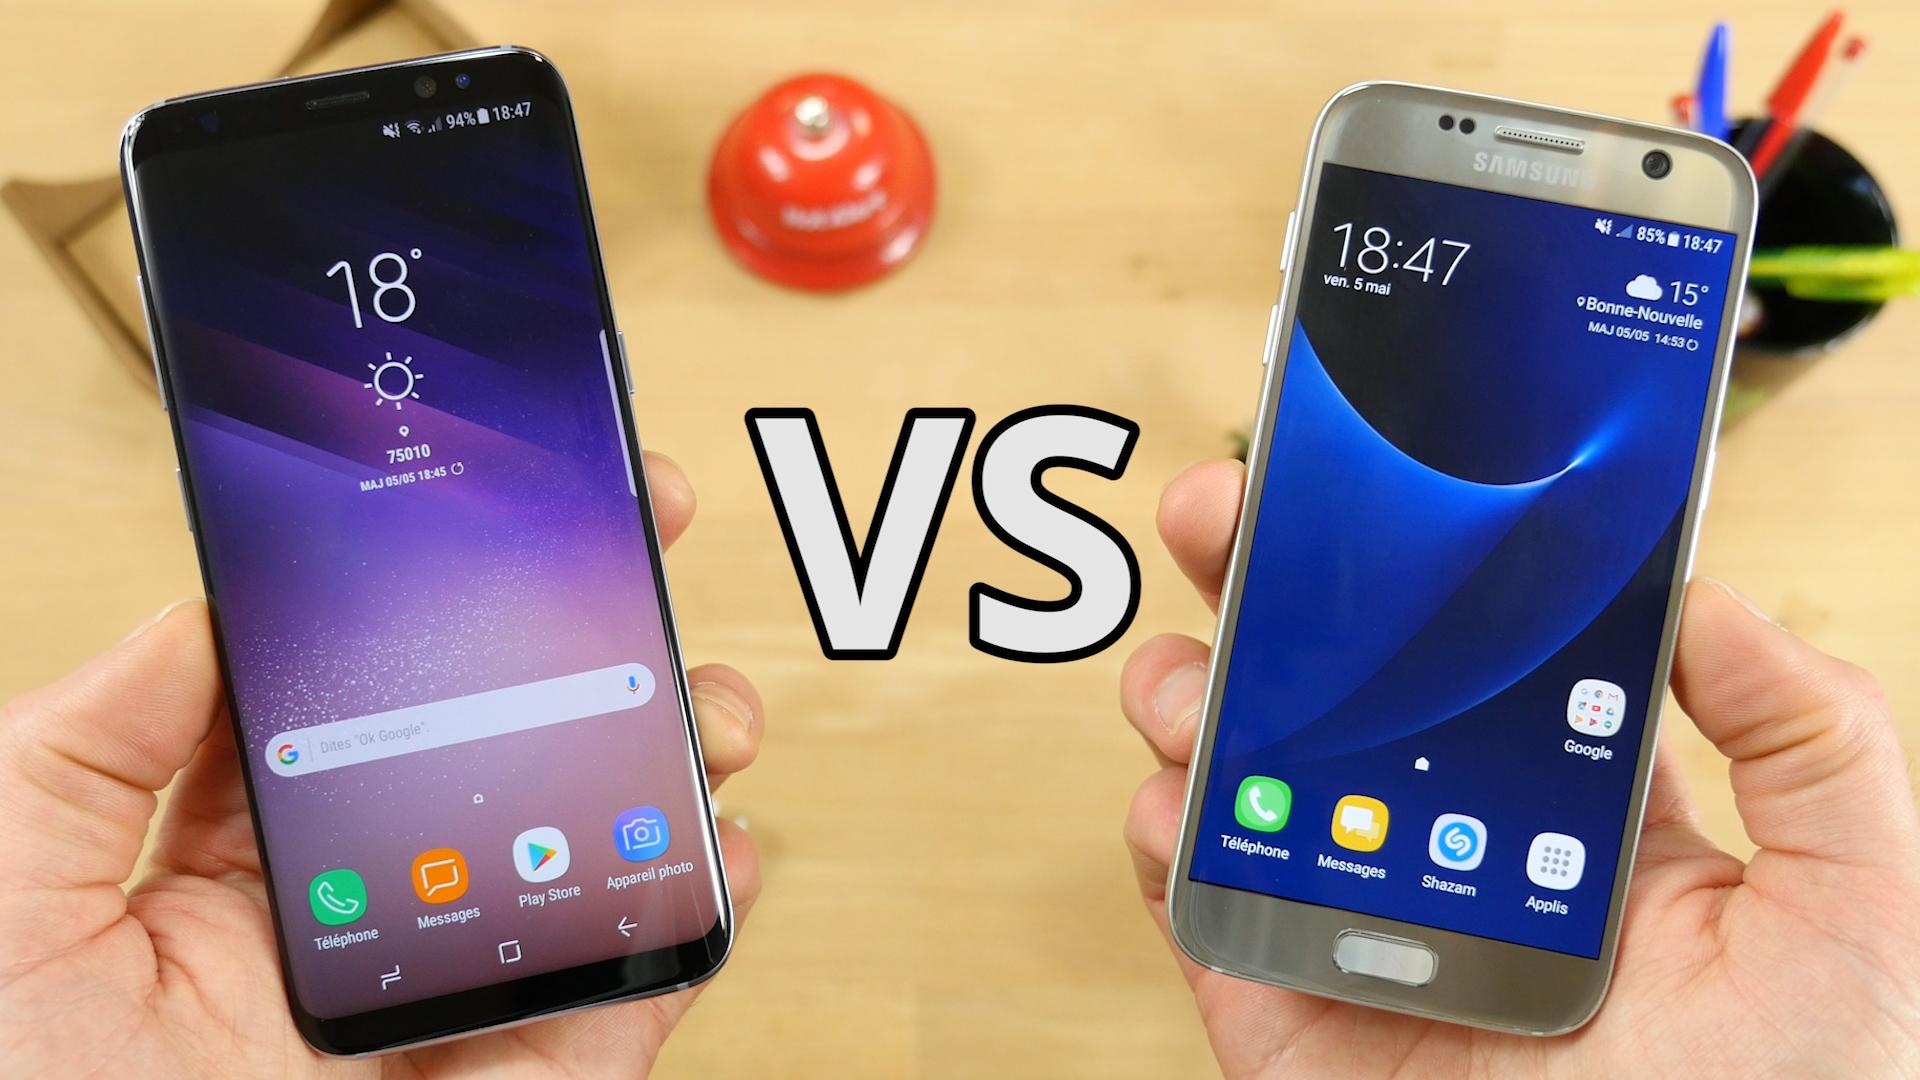 Vidéo : Samsung Galaxy S7 vs Galaxy S8, quelles différences ?